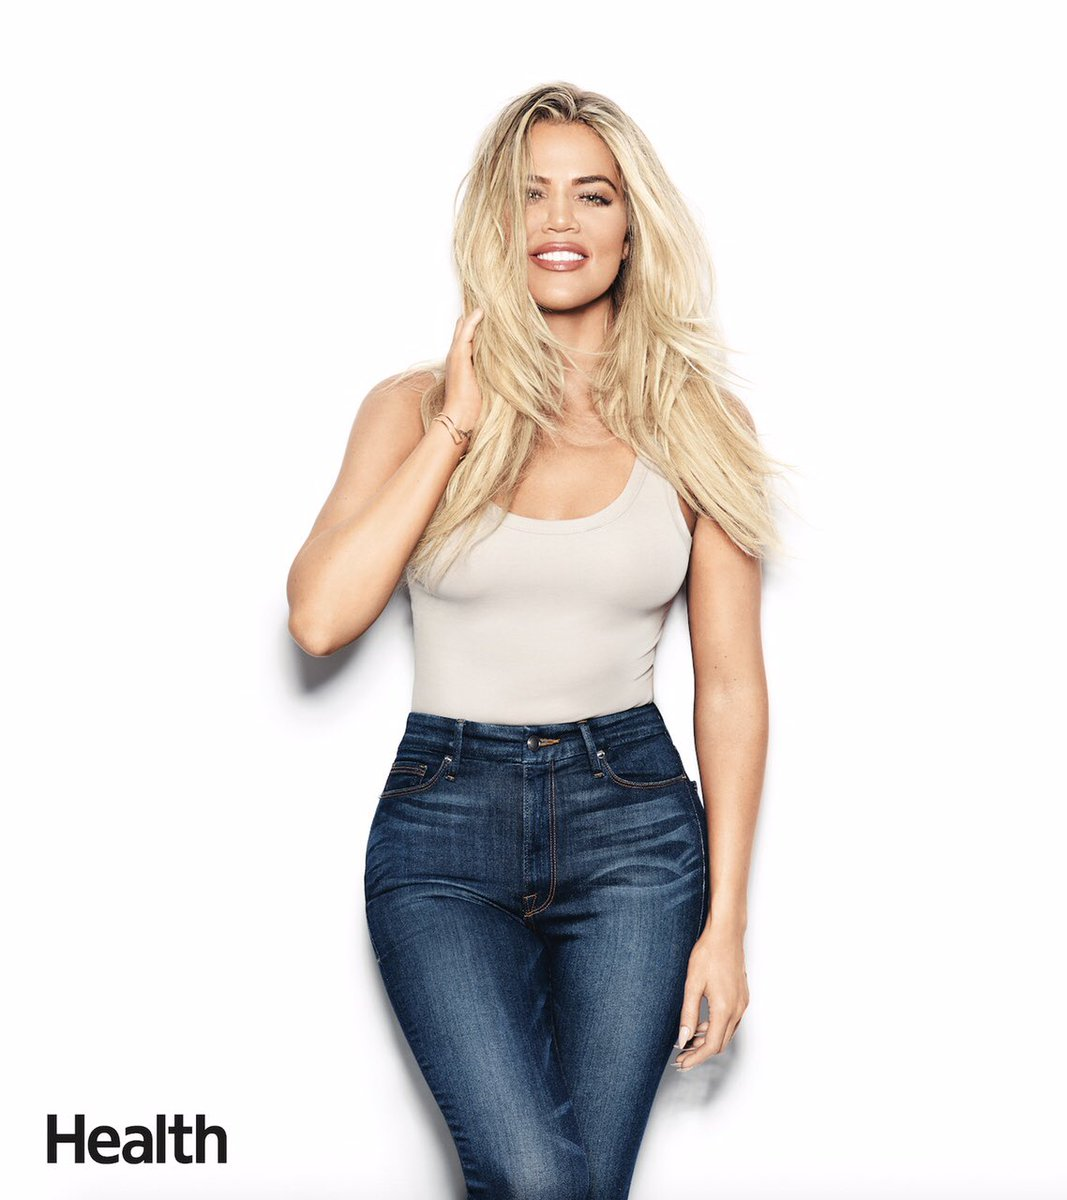 Happy and healthy in my @goodamerican denim for @healthmagazine ???? https://t.co/vsYiHZEODx